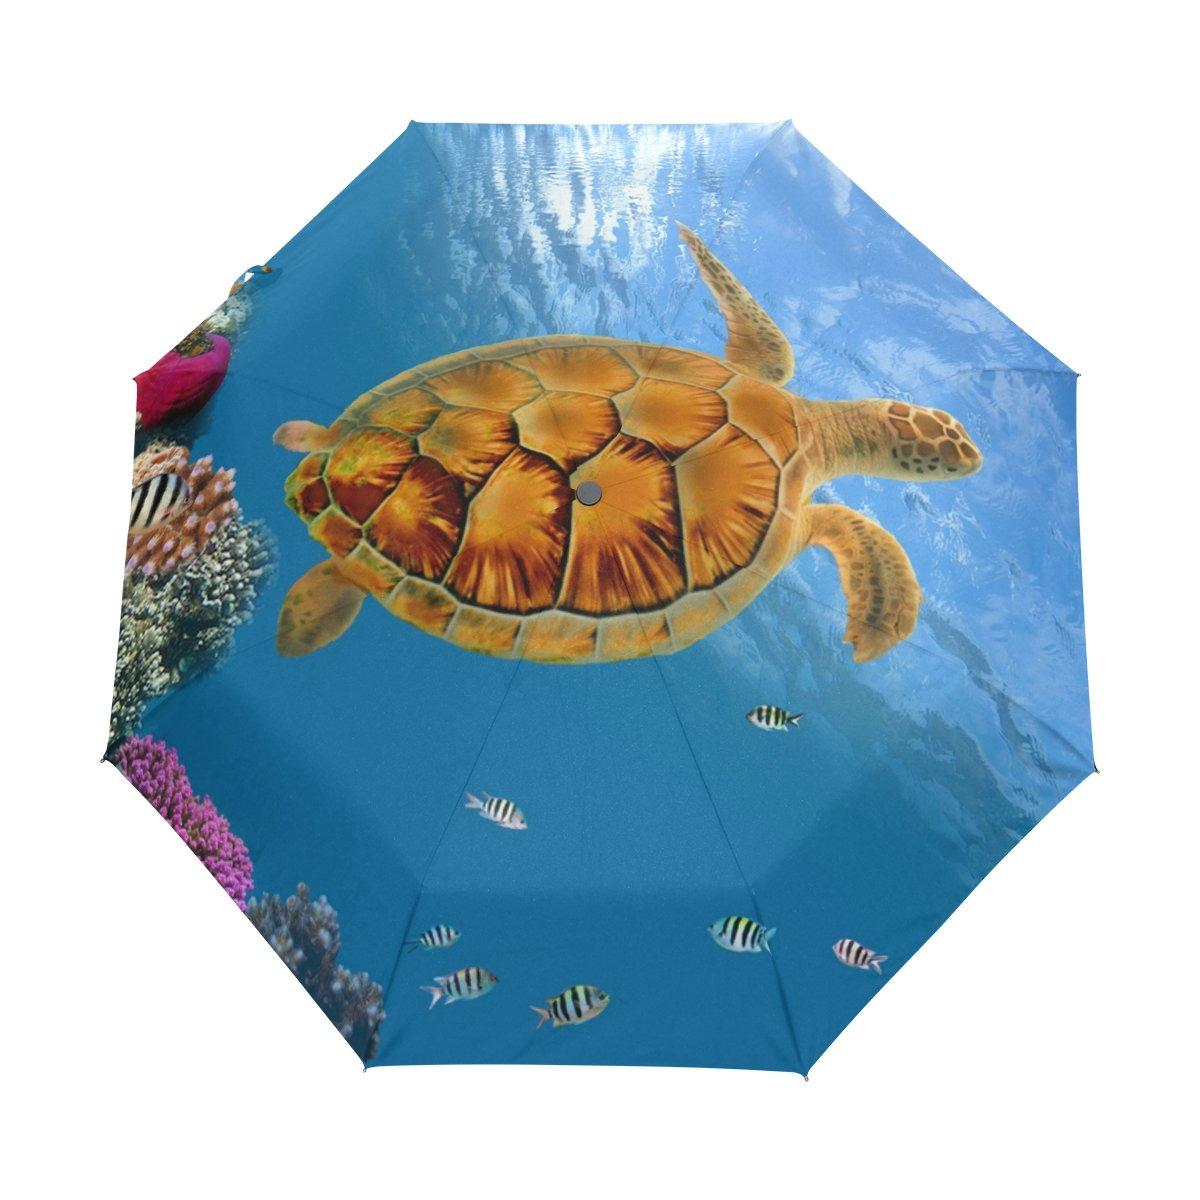 deyyaカラフルCoral Reef Sea Turtle魚防風旅行傘自動的に開く閉じる軽量コンパクトゴルフ傘 B075GX4YC1